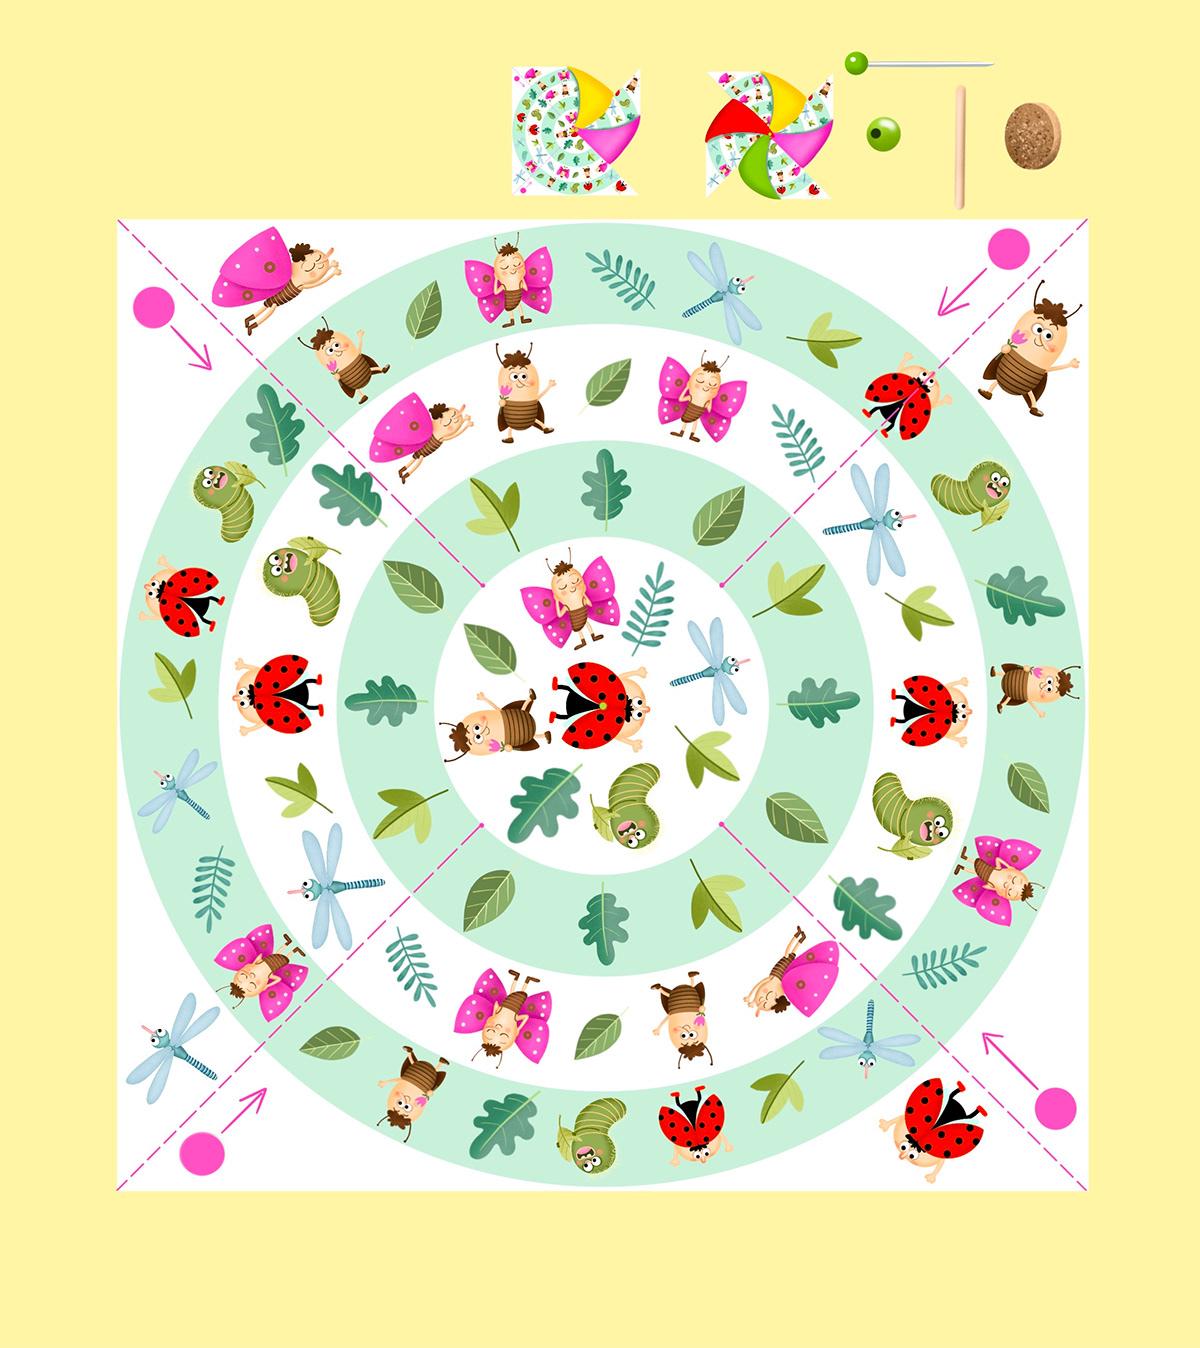 butterfly dragonfly insect ladybird summer windmill beetles children book children illustration